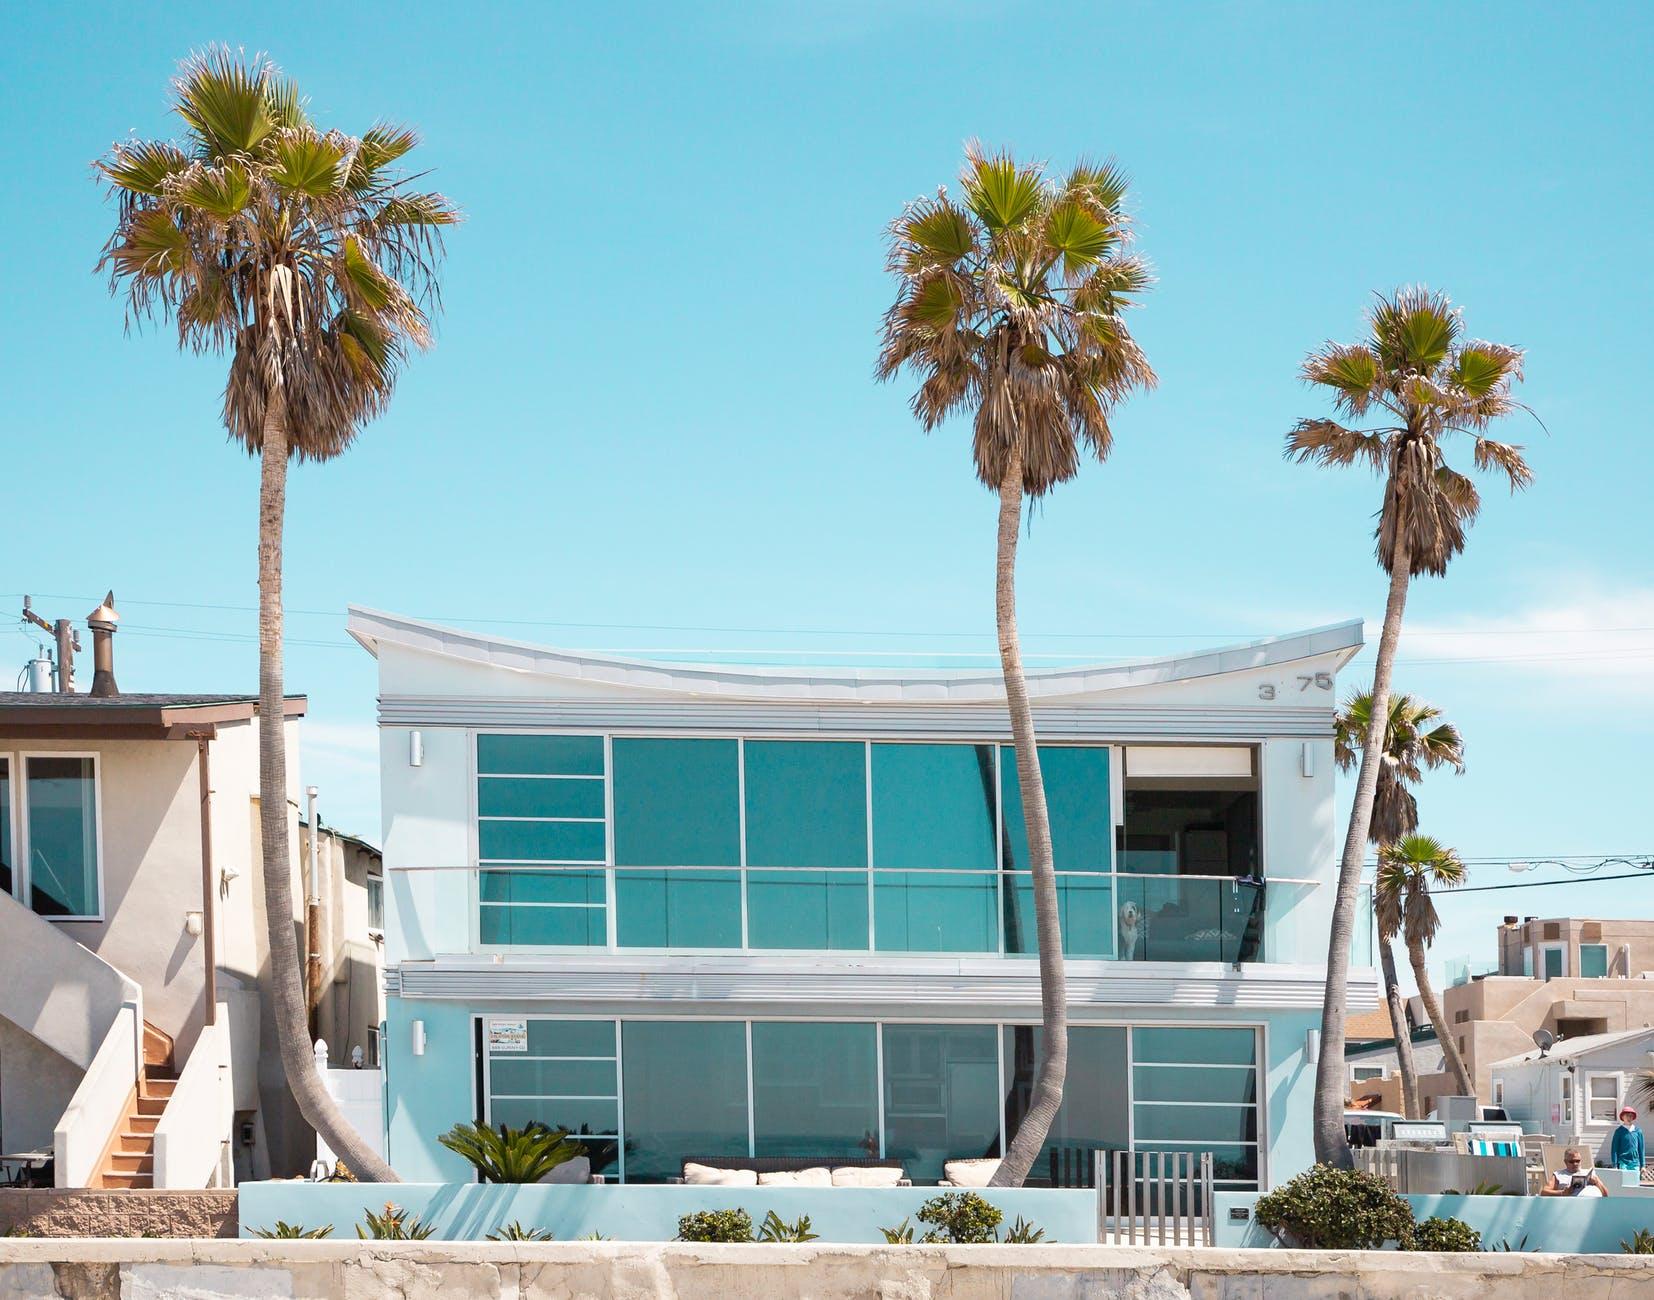 9 Inspirasi Desain Rumah Idaman Modern